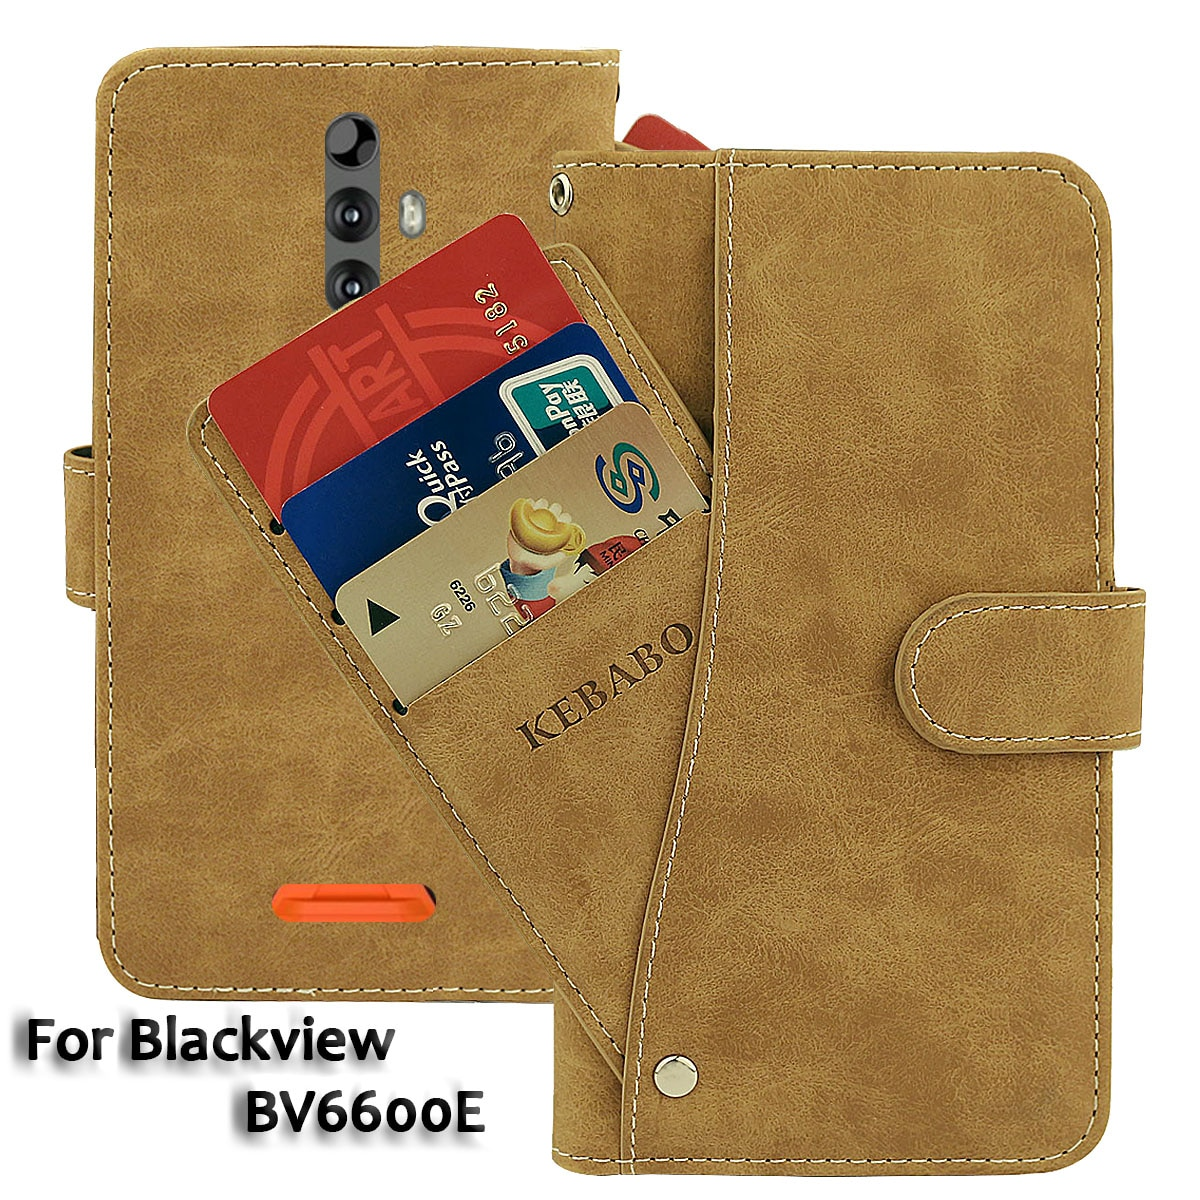 Vintage Leather Wallet Blackview BV6600E Case 5.7